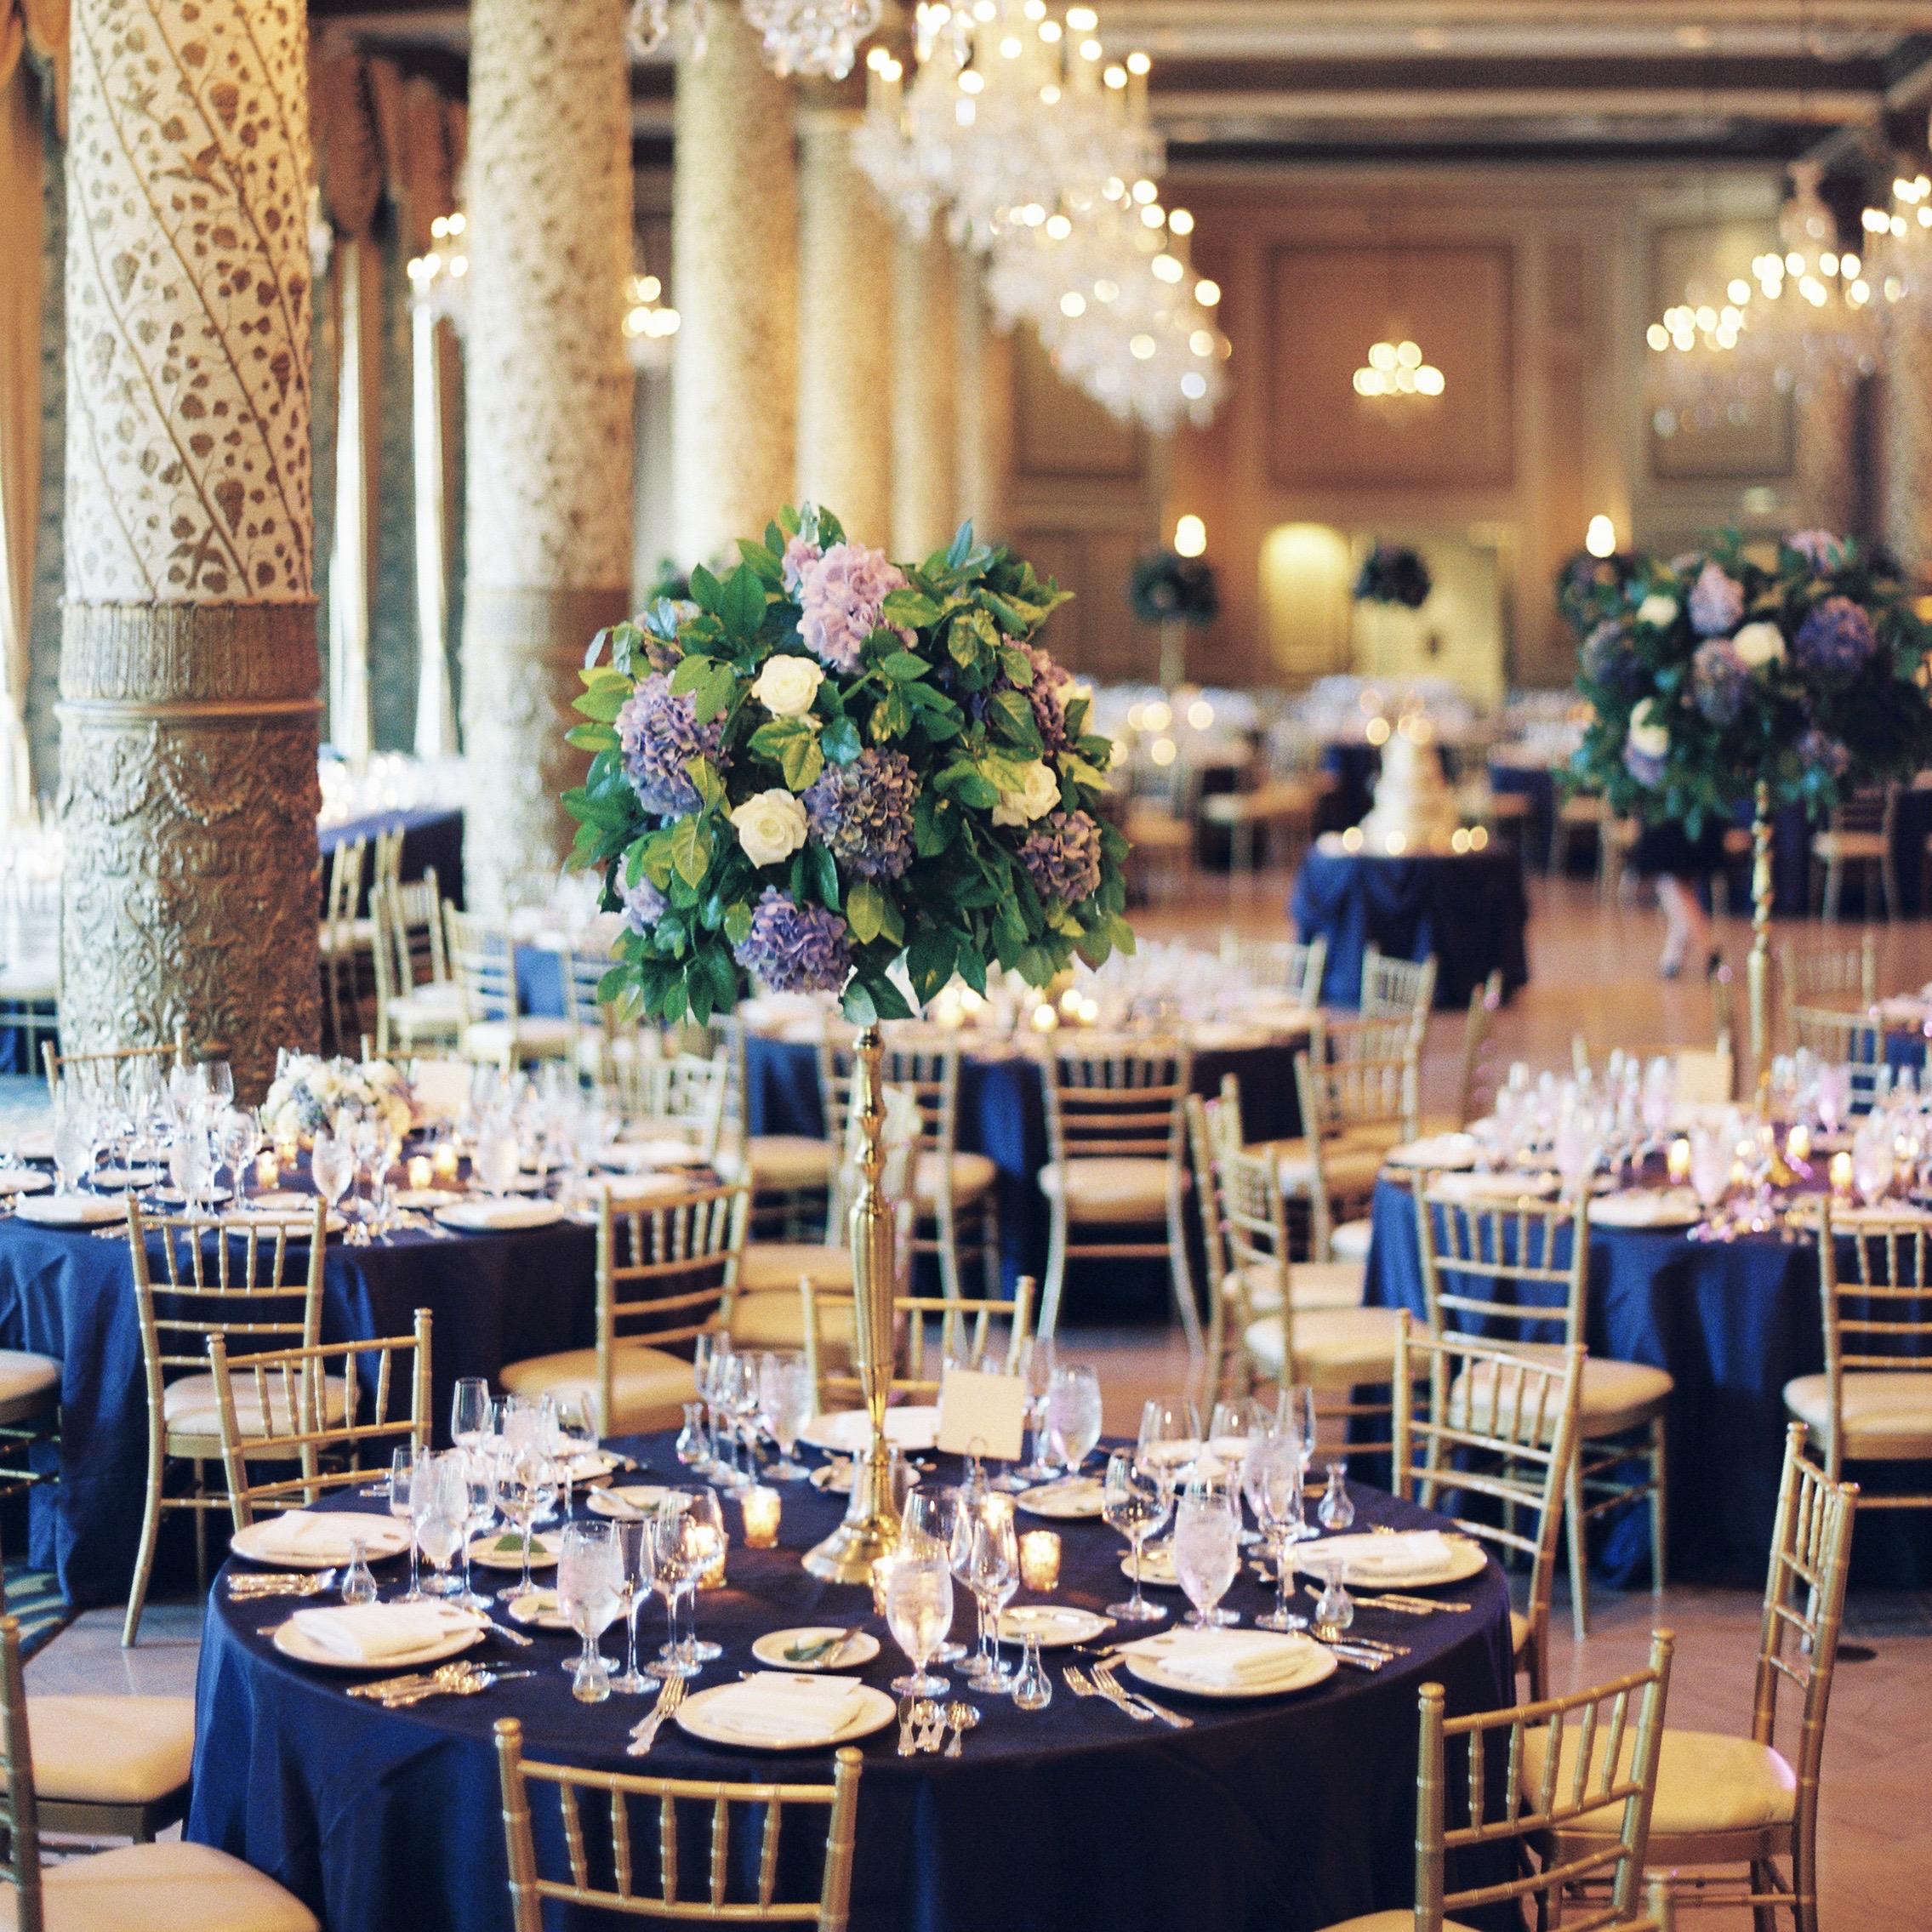 Kristin-La-Voie-Photography-Drake-Hotel-Chicago-Wedding-152